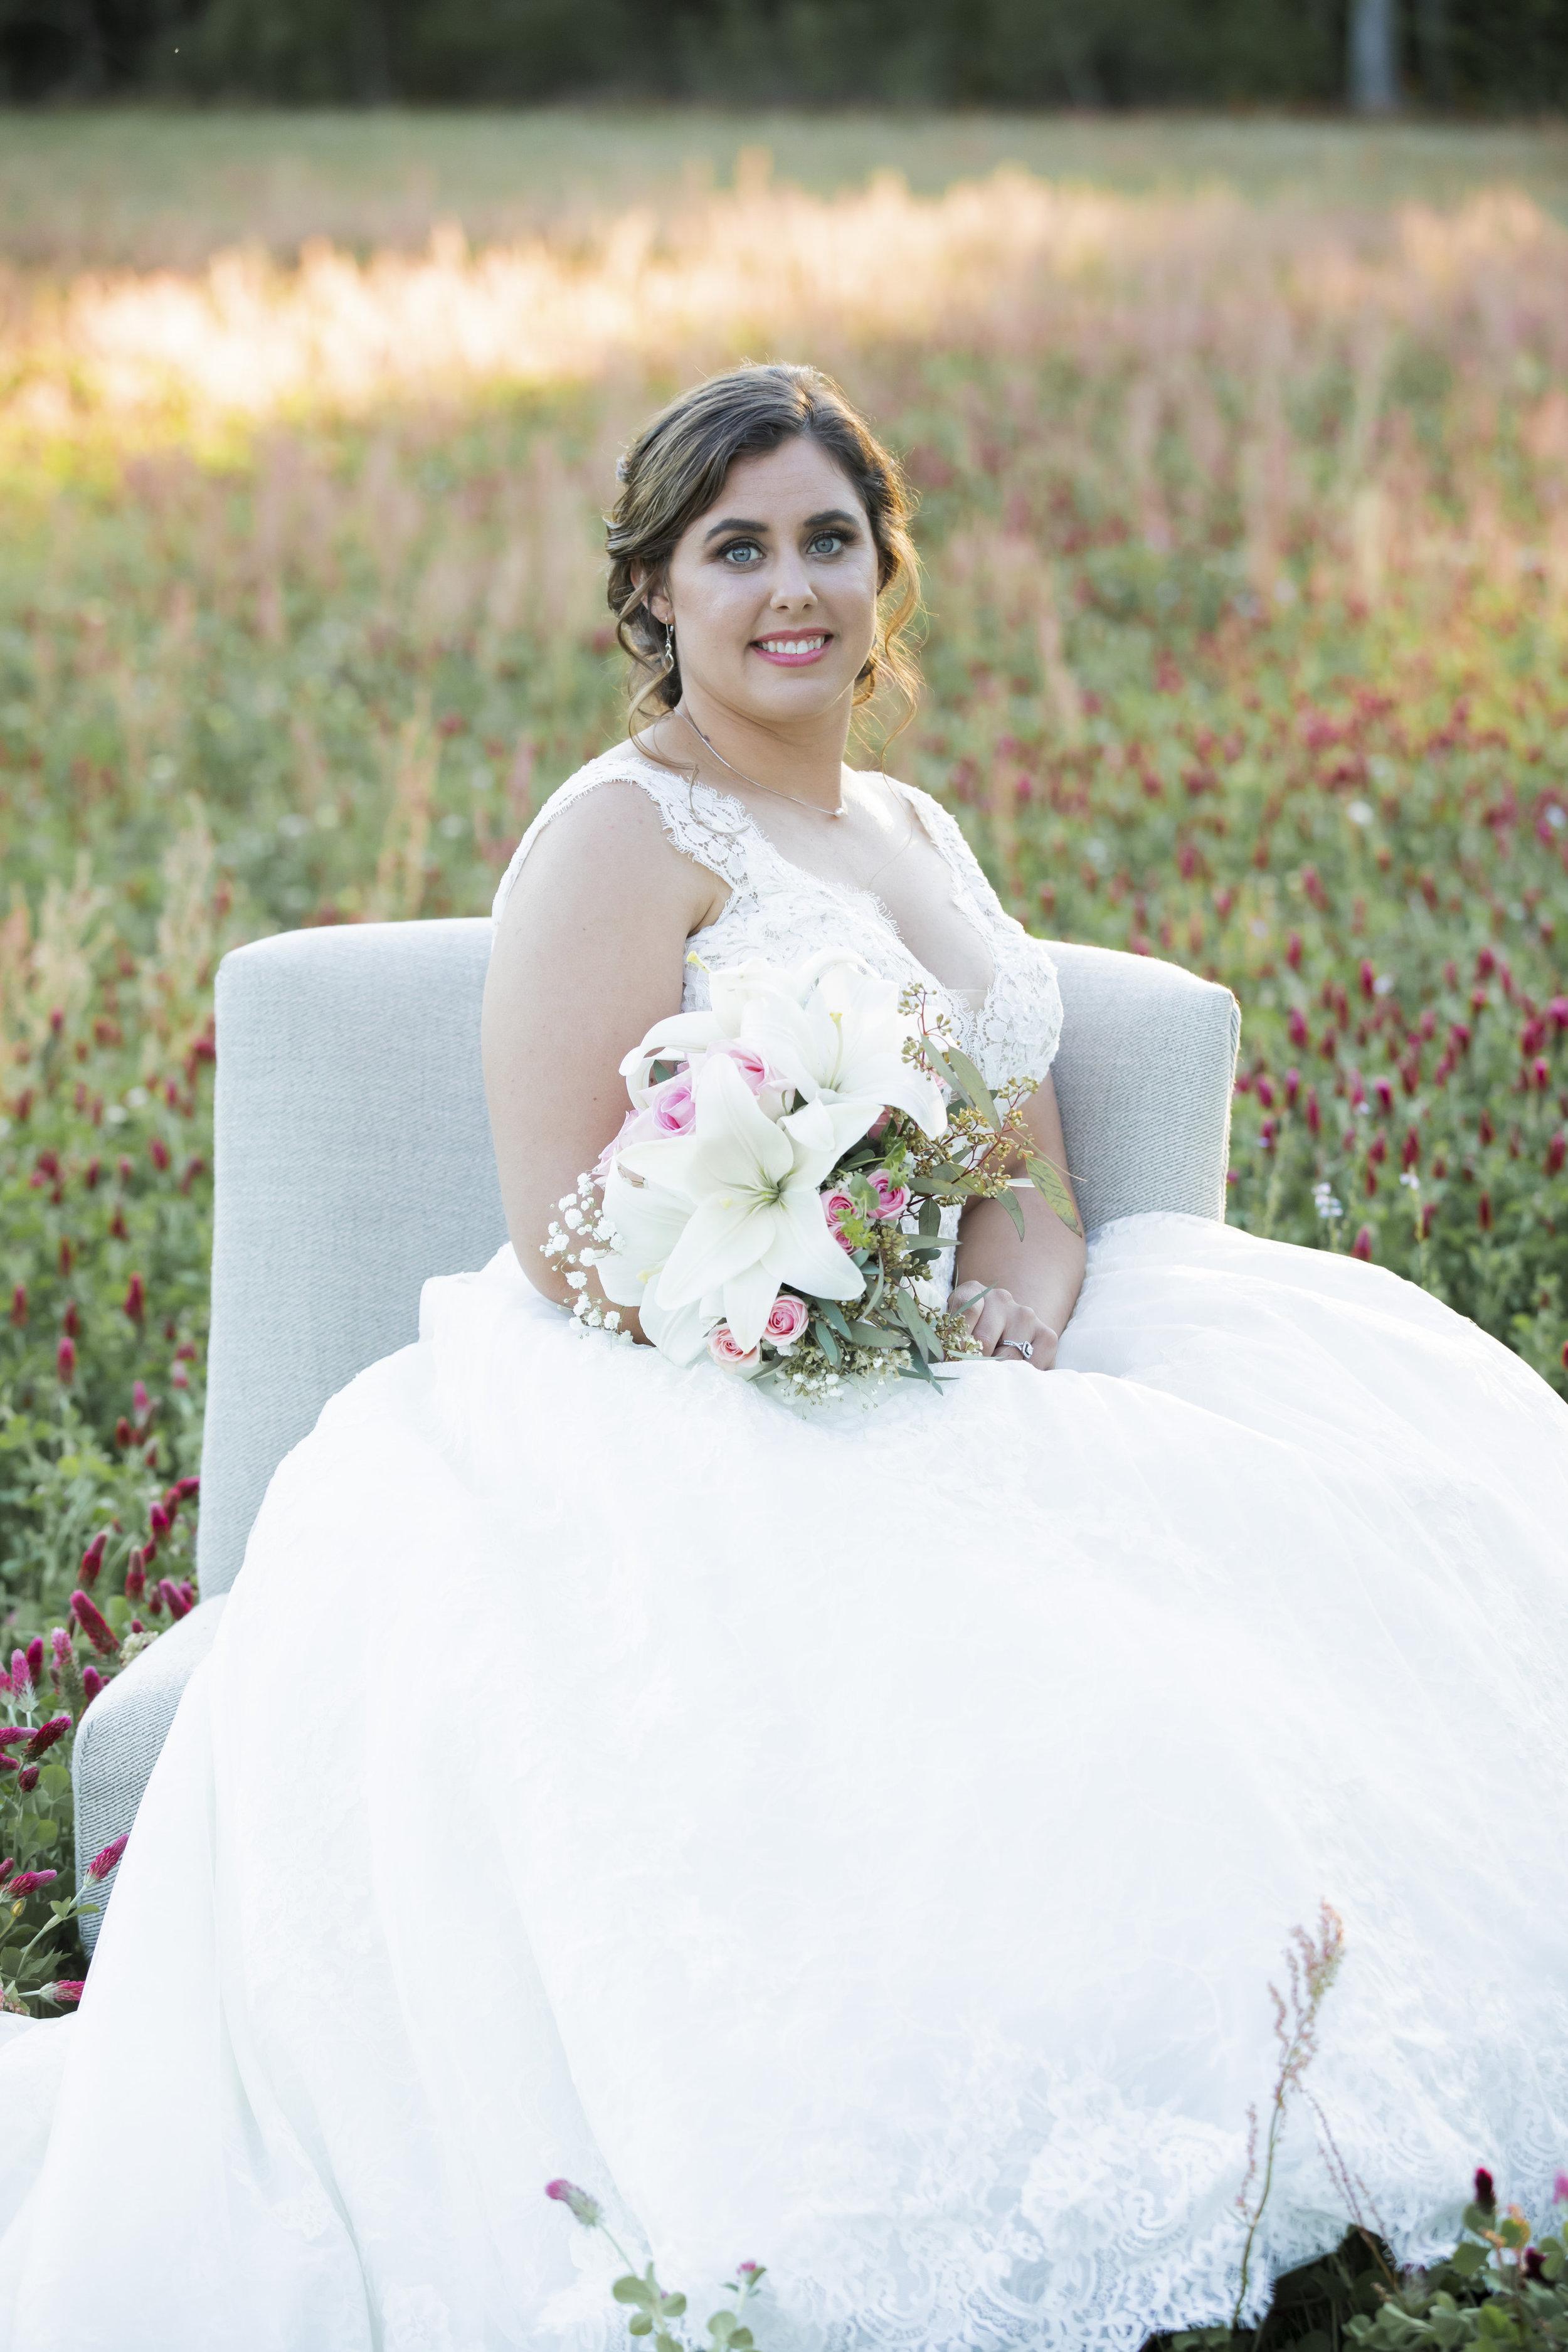 Bridal-Bridal-0061.jpg